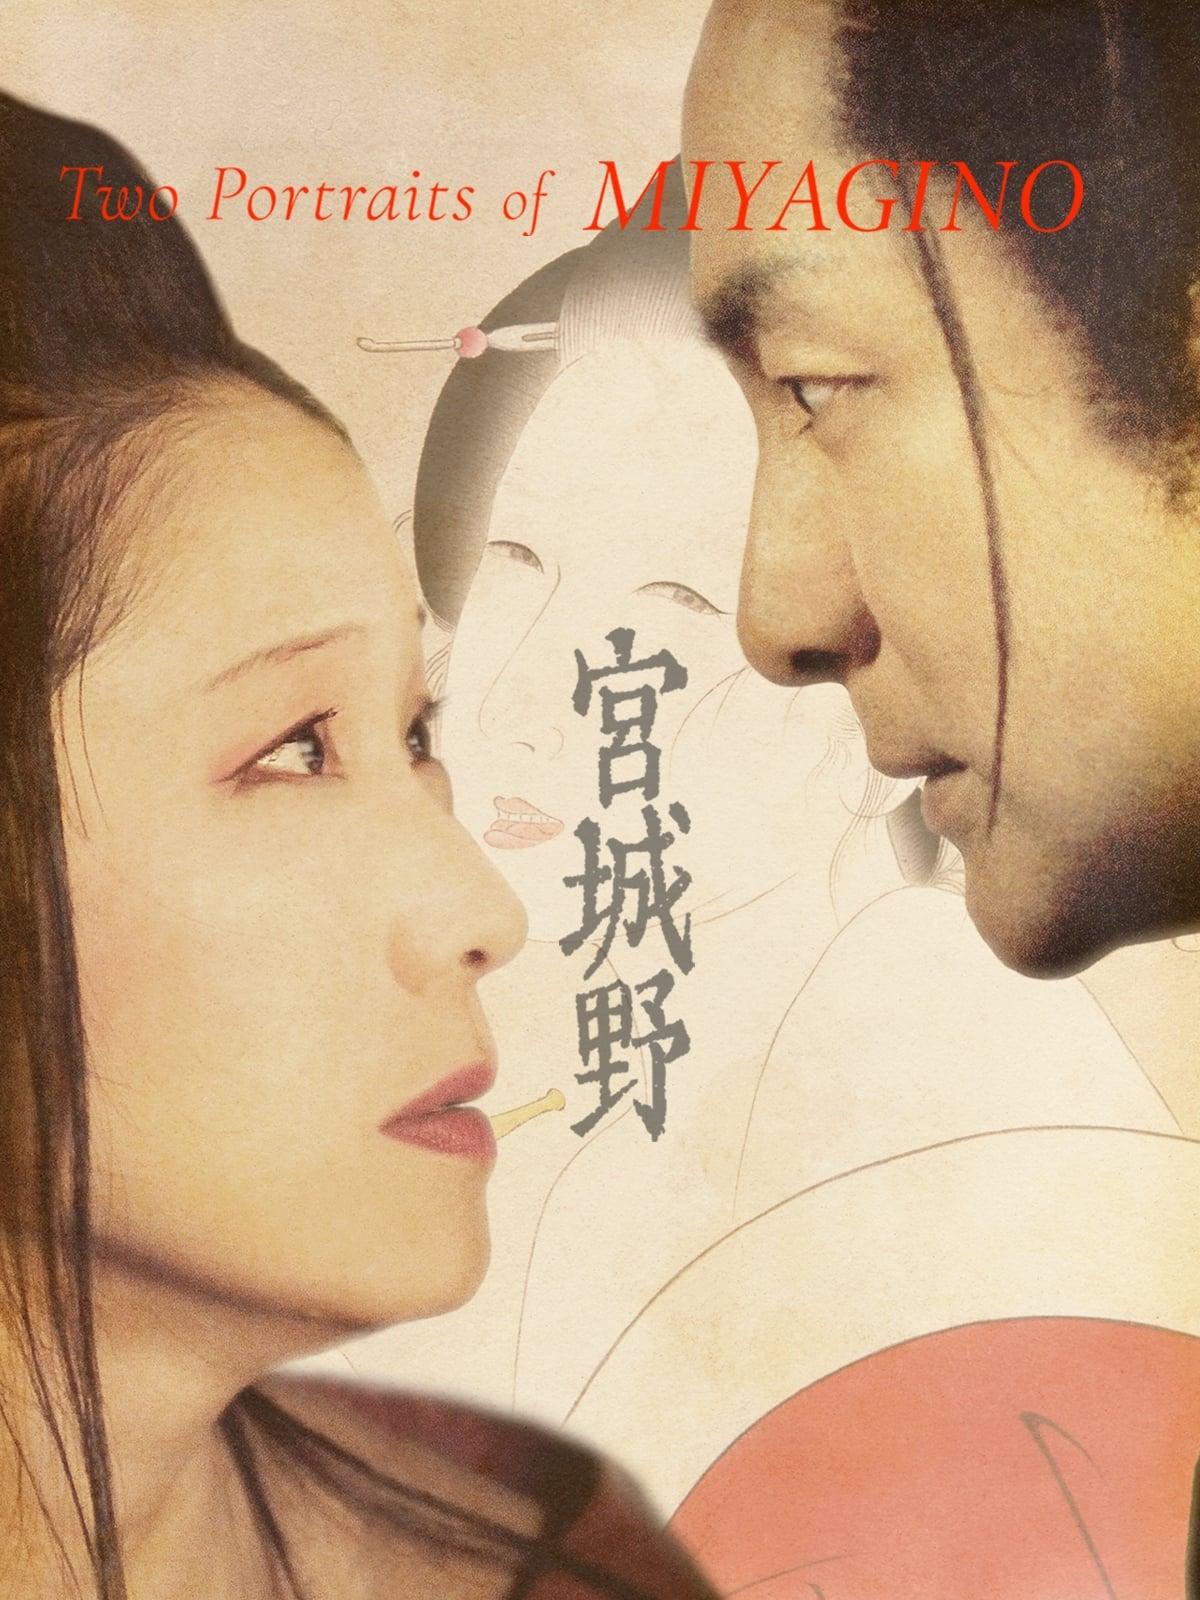 Two Portraits of MIYAGINO